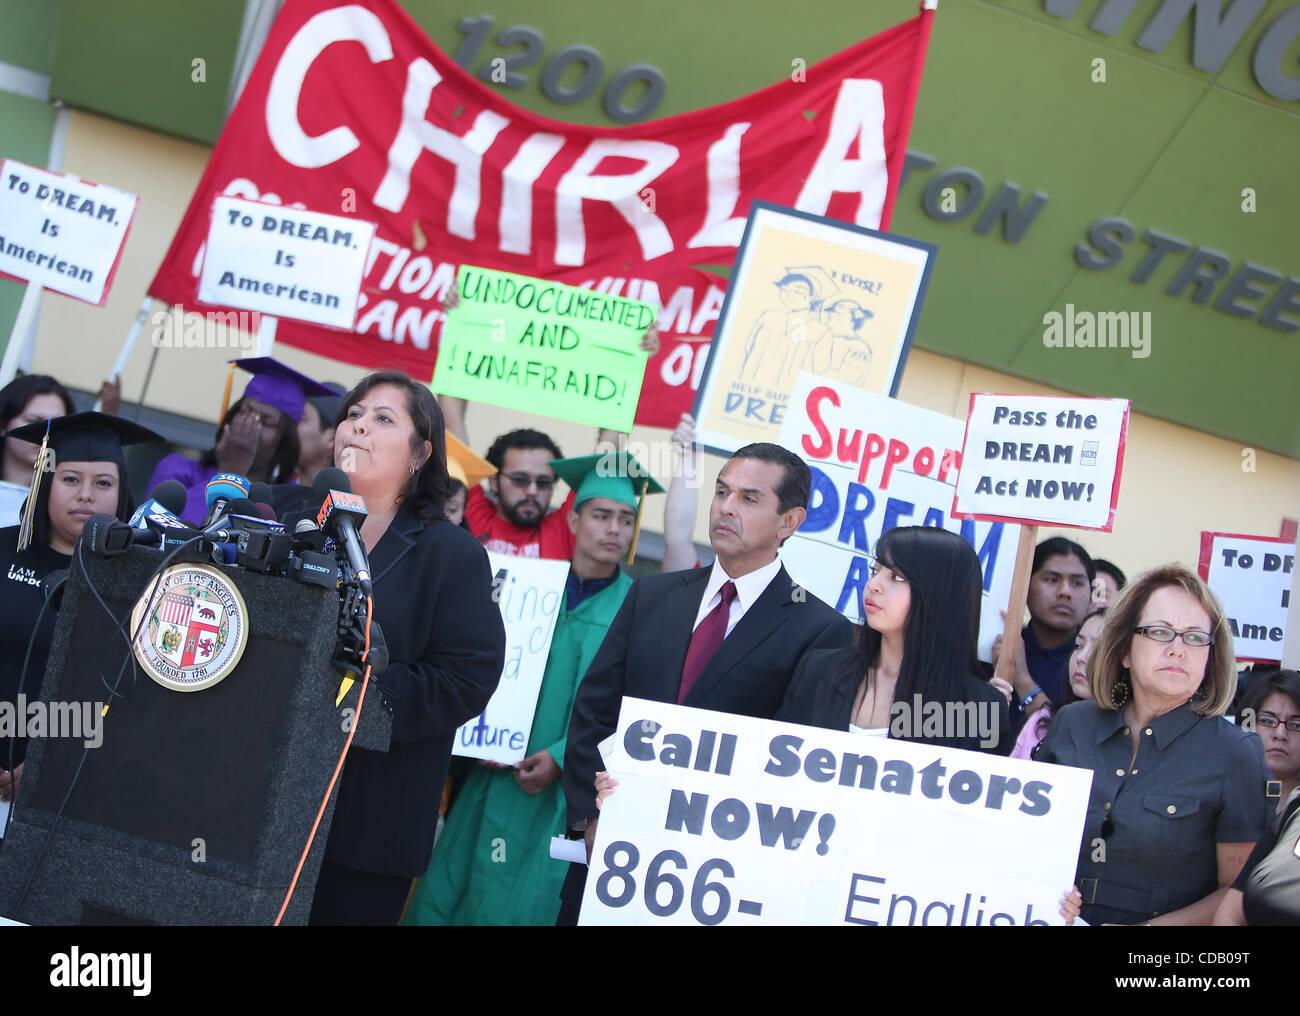 Sep 20, 2010 - Los Angeles, California, USA - Los Angeles Unified School District (LAUSD) President MONICA GARCIA - Stock Image